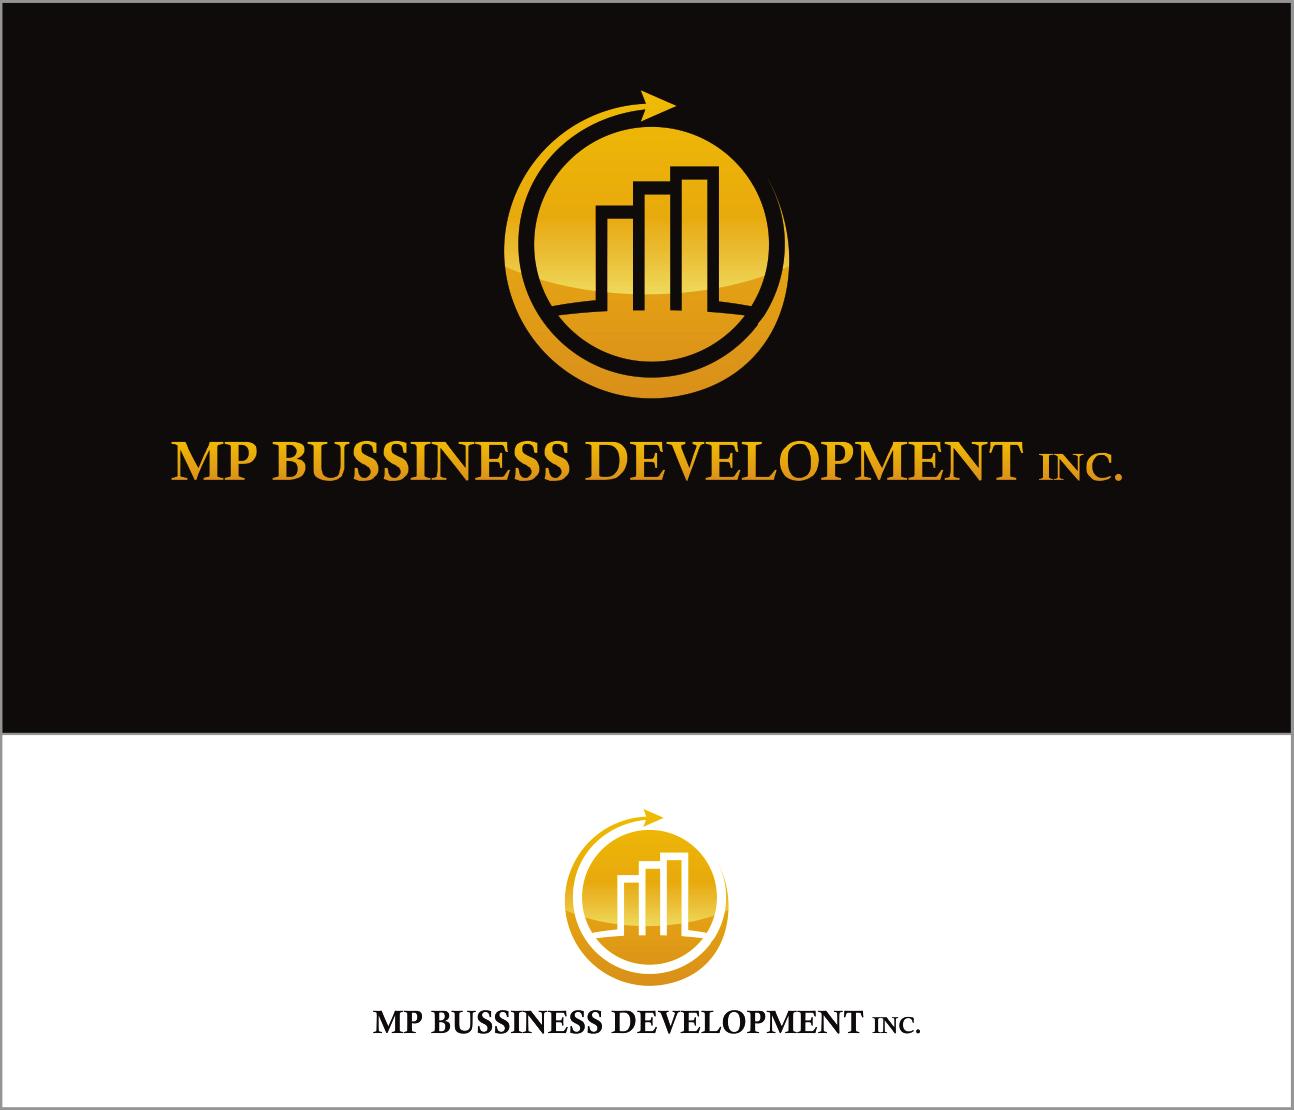 Logo Design by Armada Jamaluddin - Entry No. 198 in the Logo Design Contest MP Business Development Inc. Logo Design.